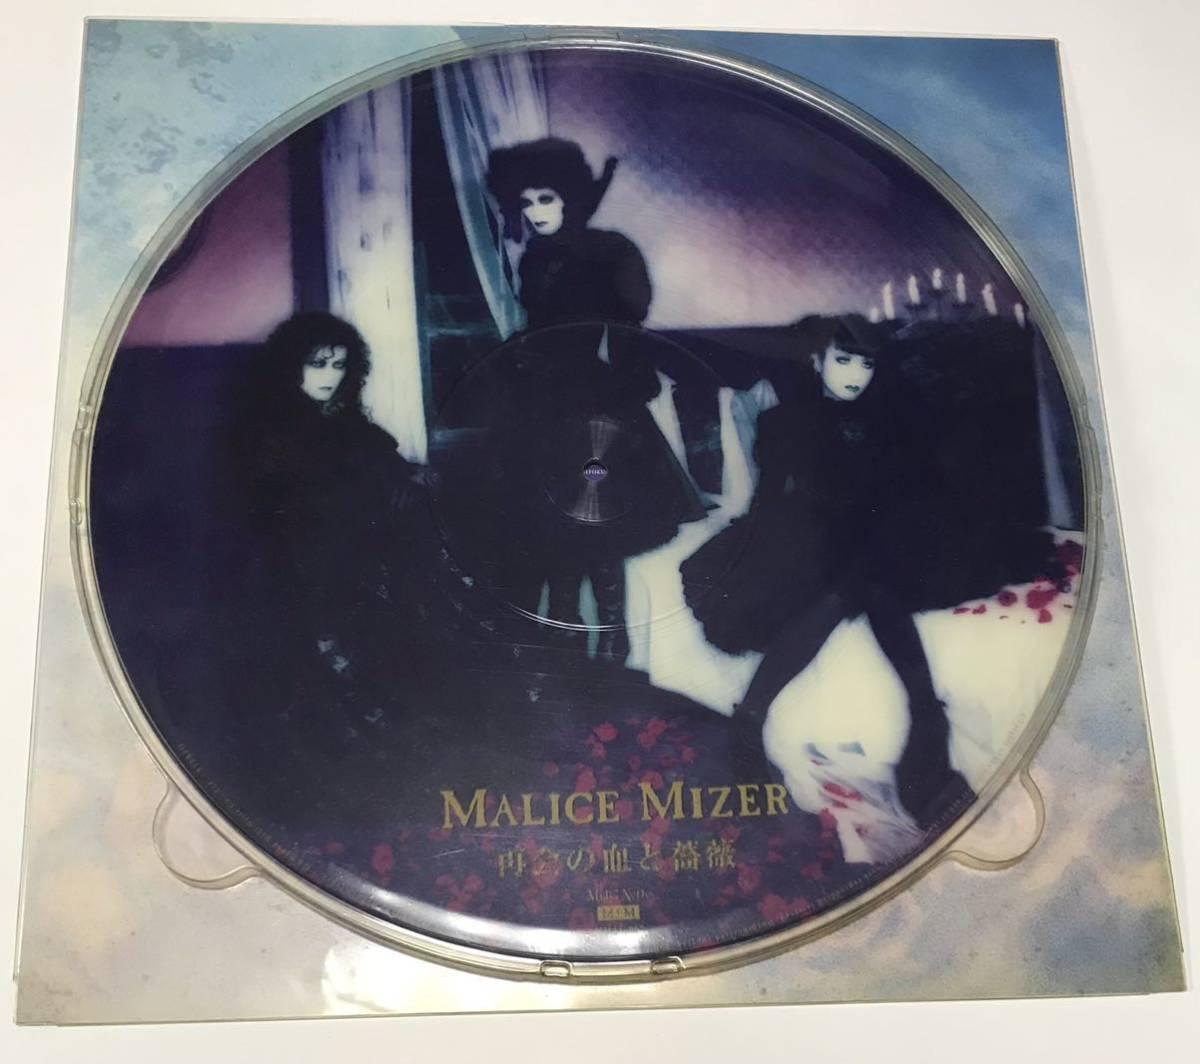 MALICE MIZER 再会の血と薔薇 アナログ盤 ※試聴未確認_画像1